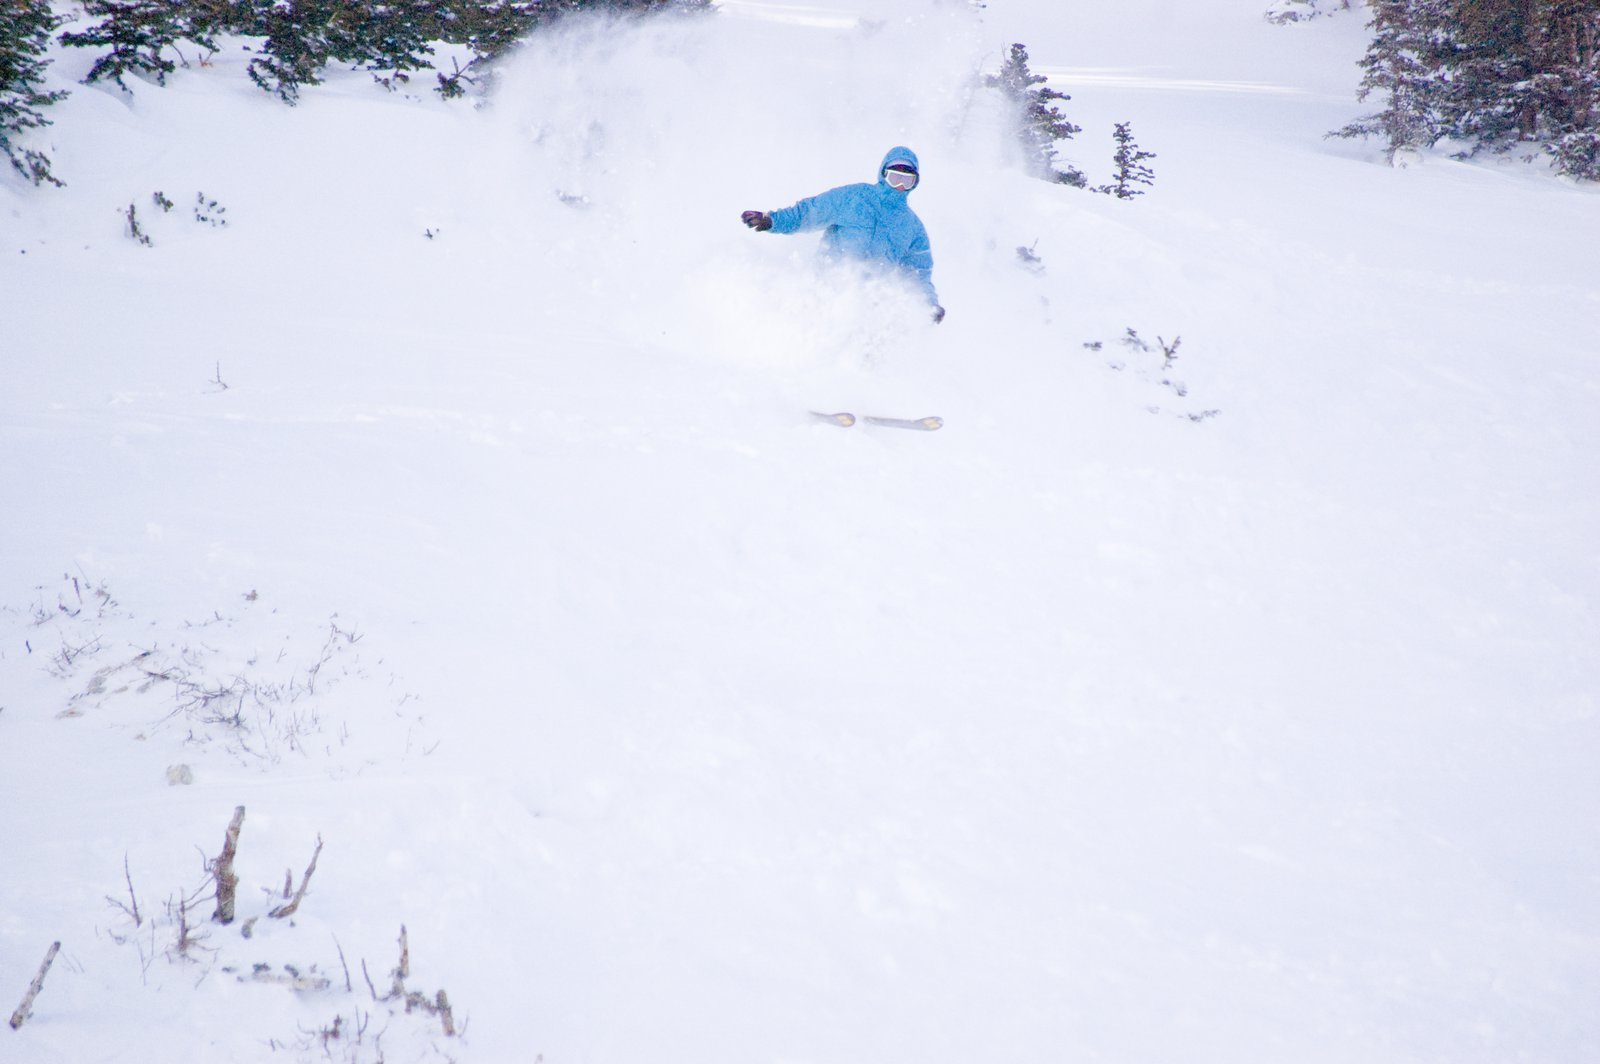 Day at snowbird